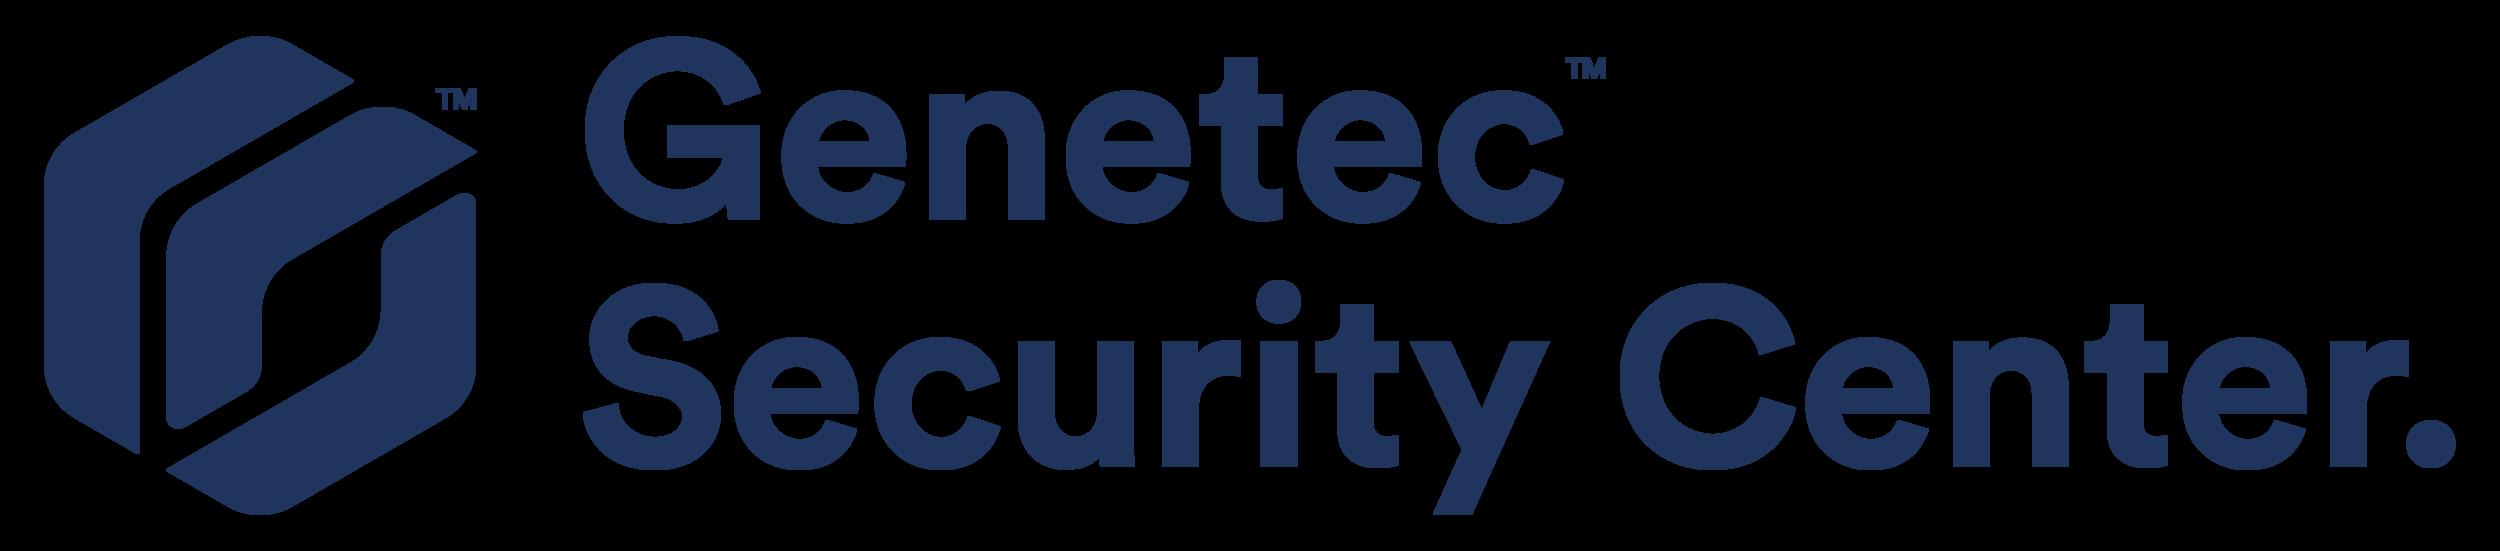 Security Center logo- colour RGB.png